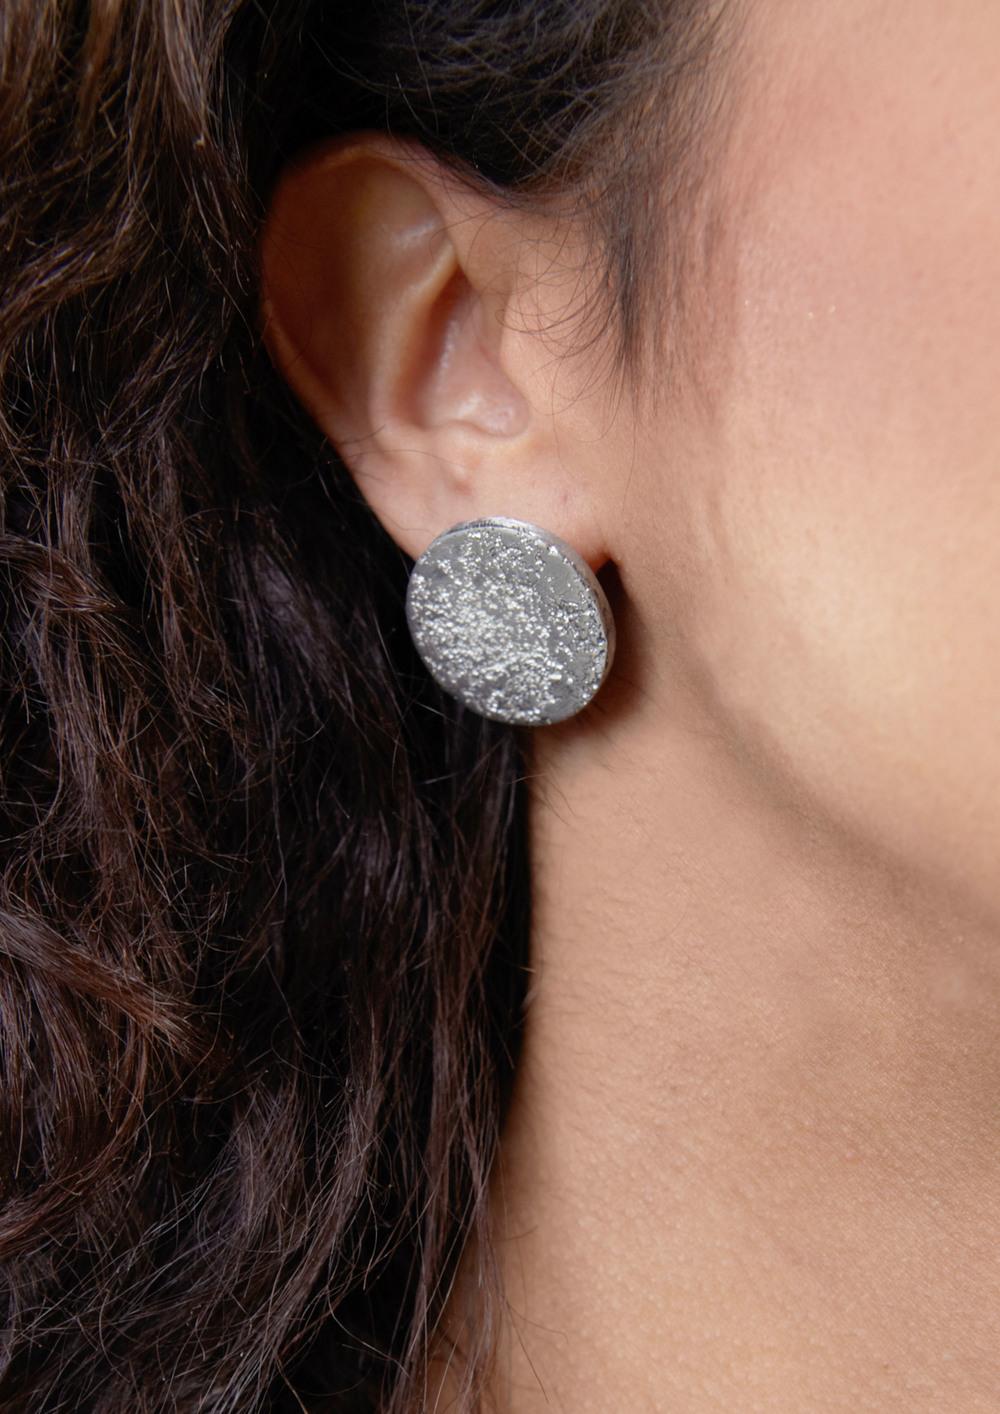 earring close up 1.jpg